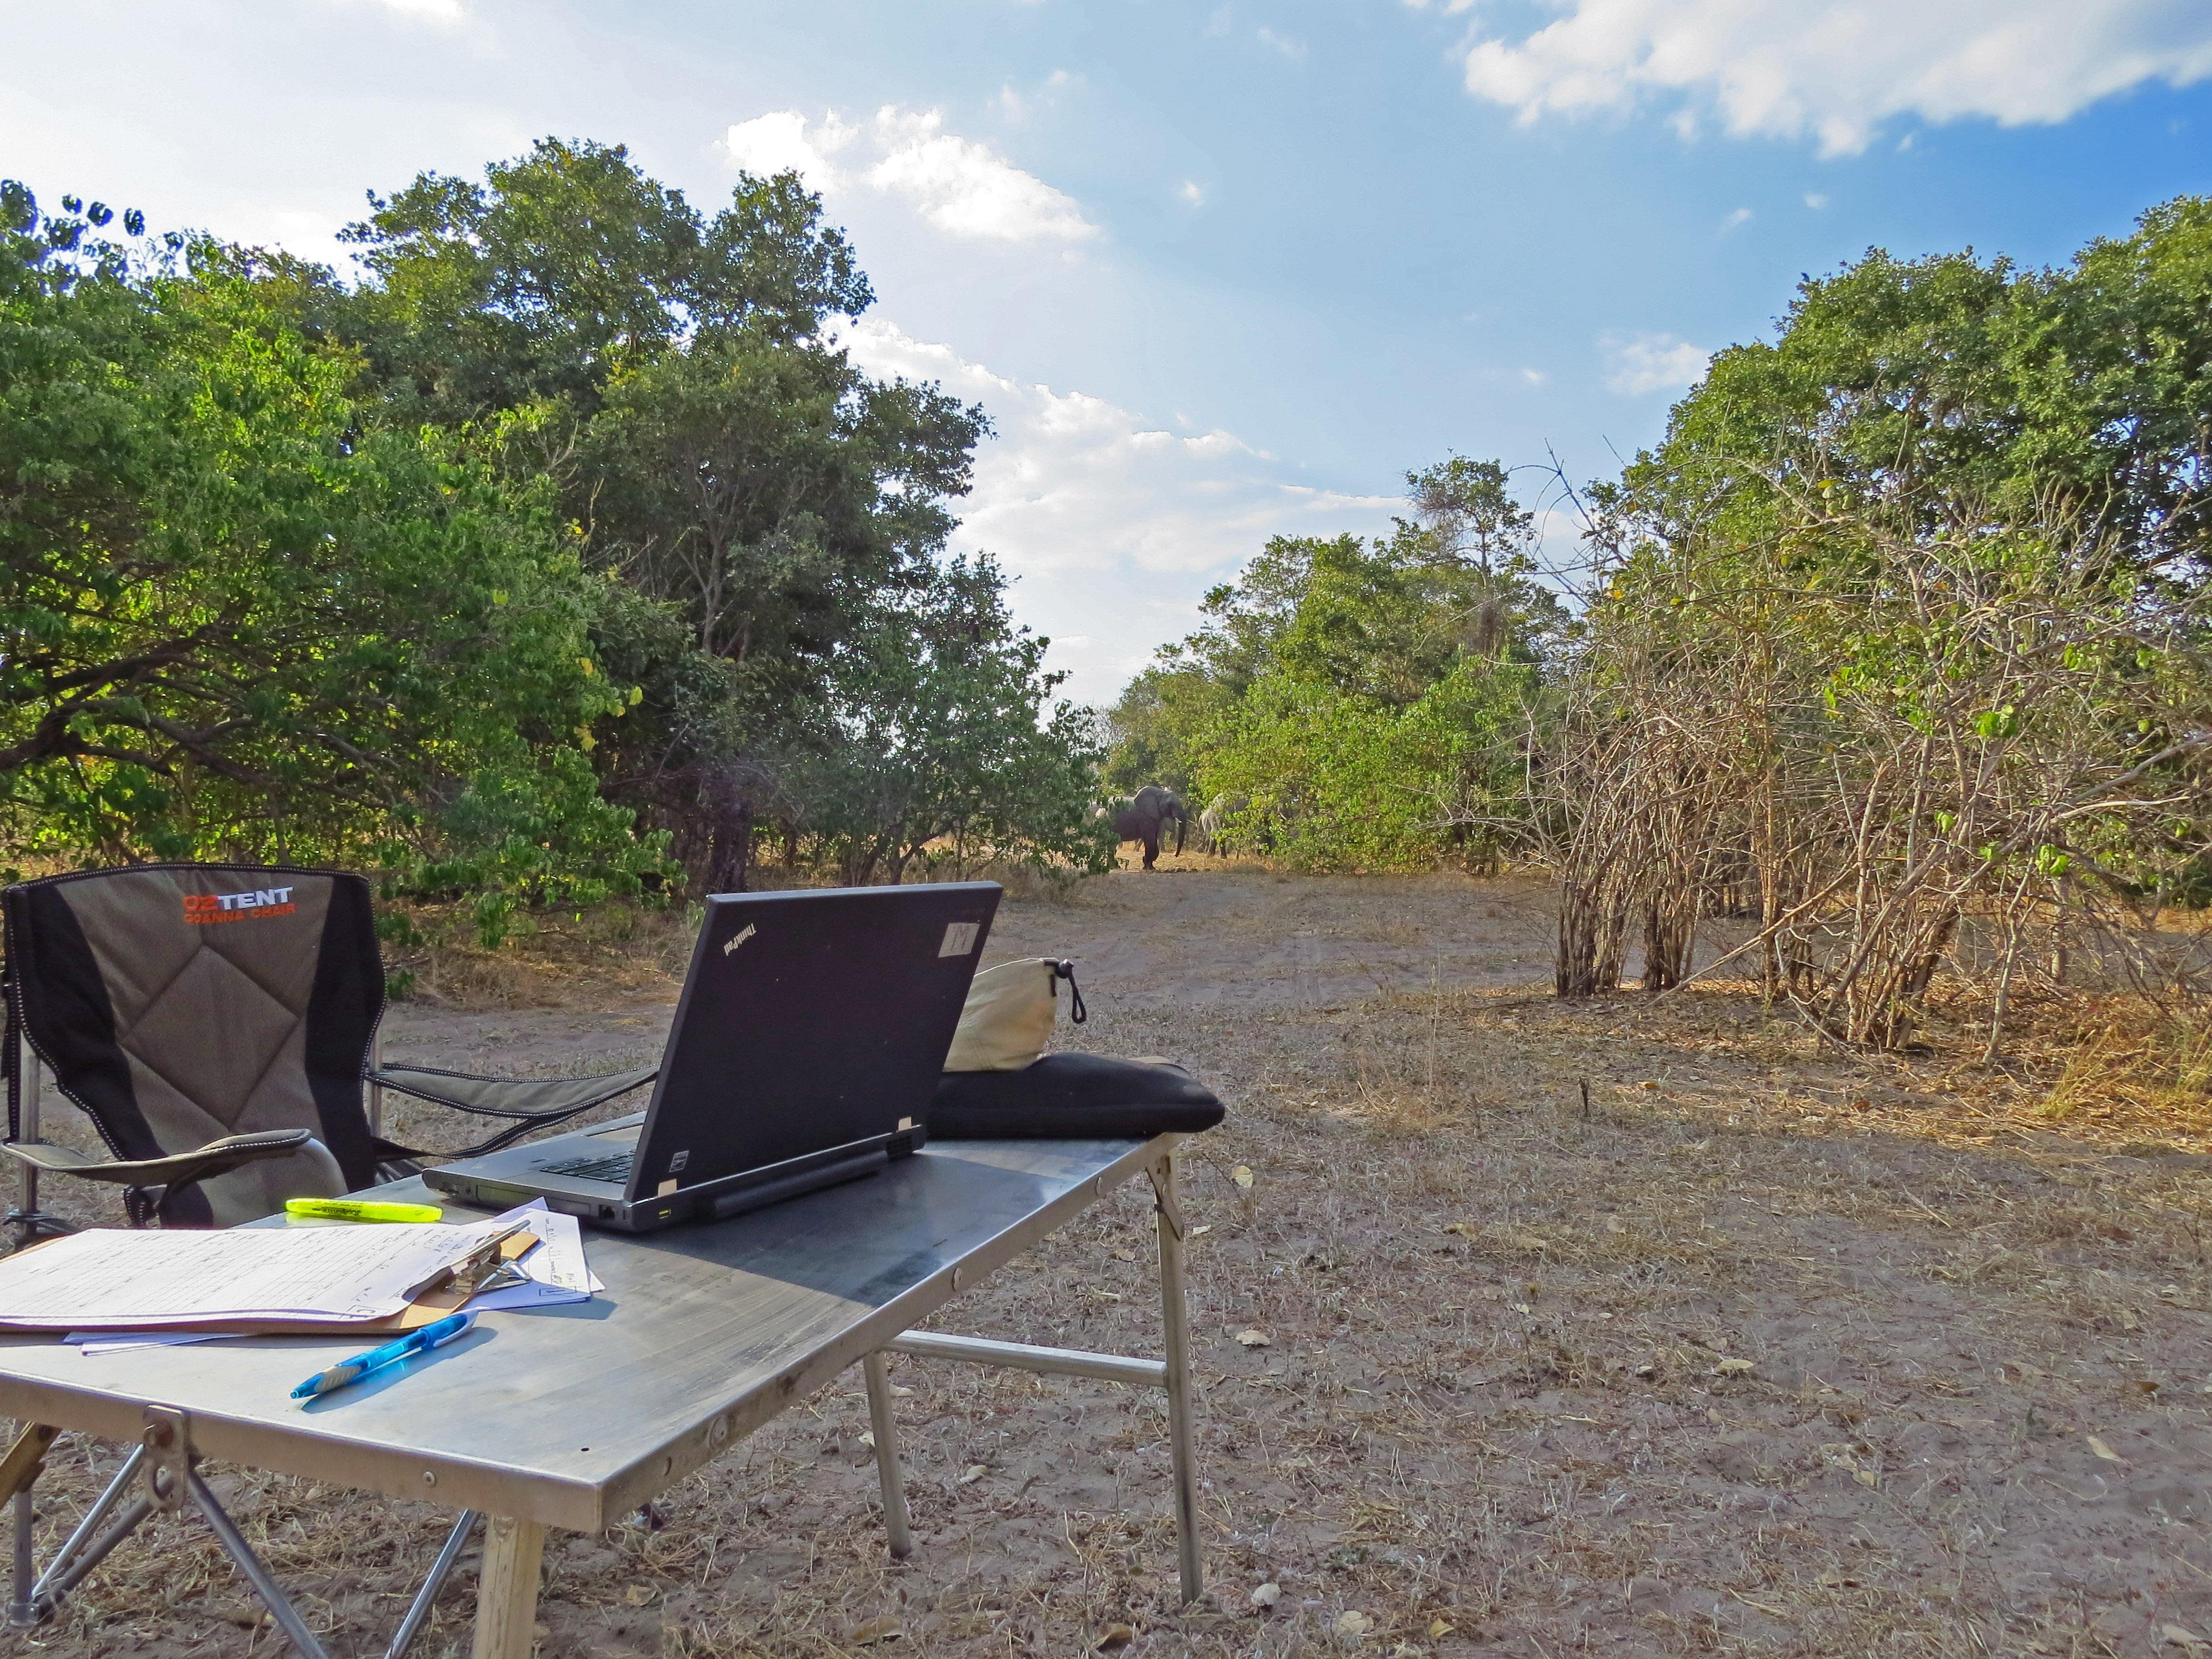 Monitoring wildlife in Africa